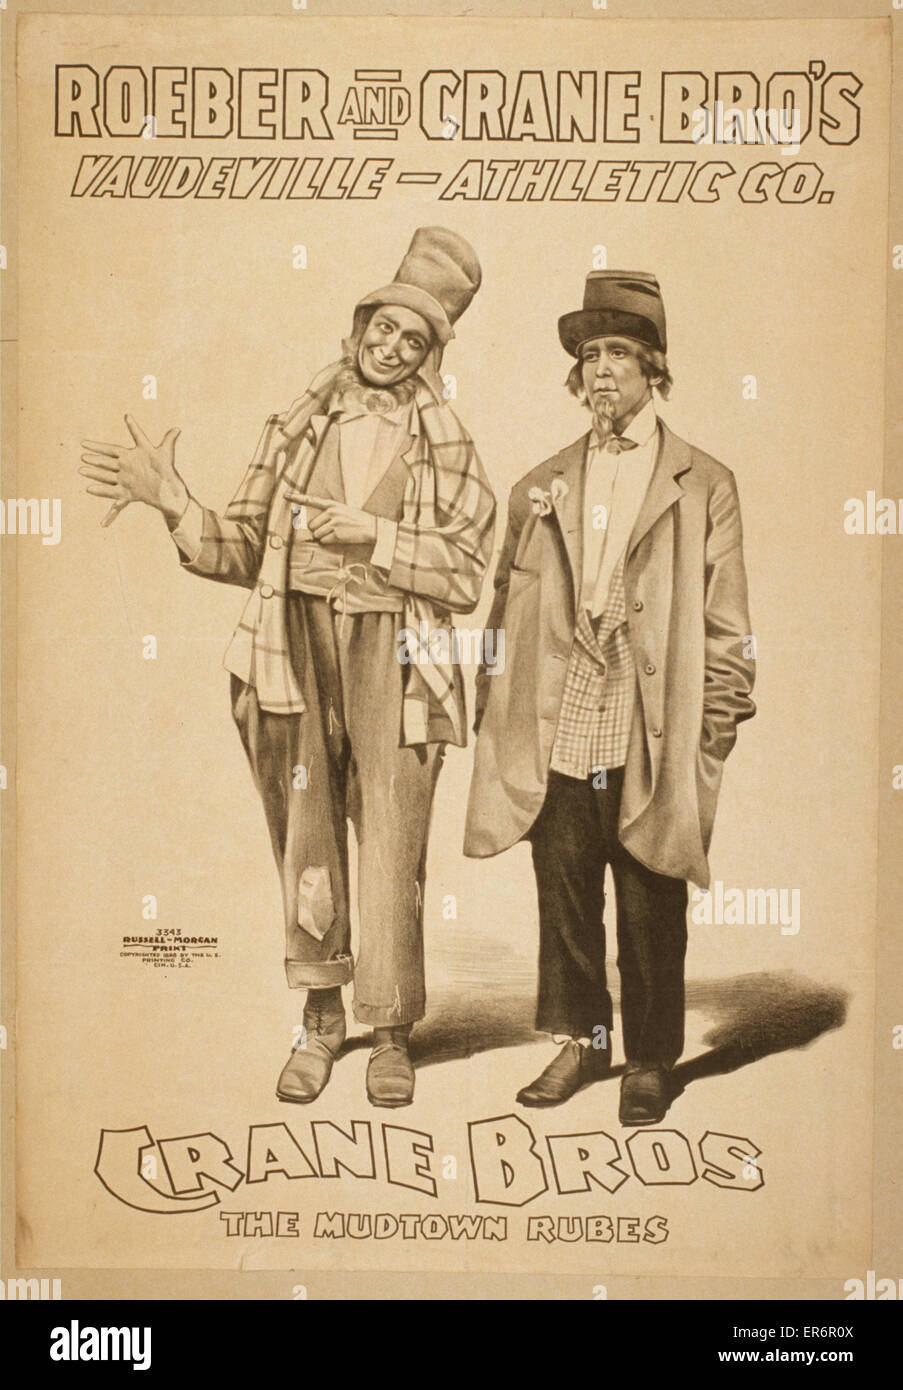 Roeber and Crane Bro's Vaudeville-Athletic Co. Date c1898. - Stock Image